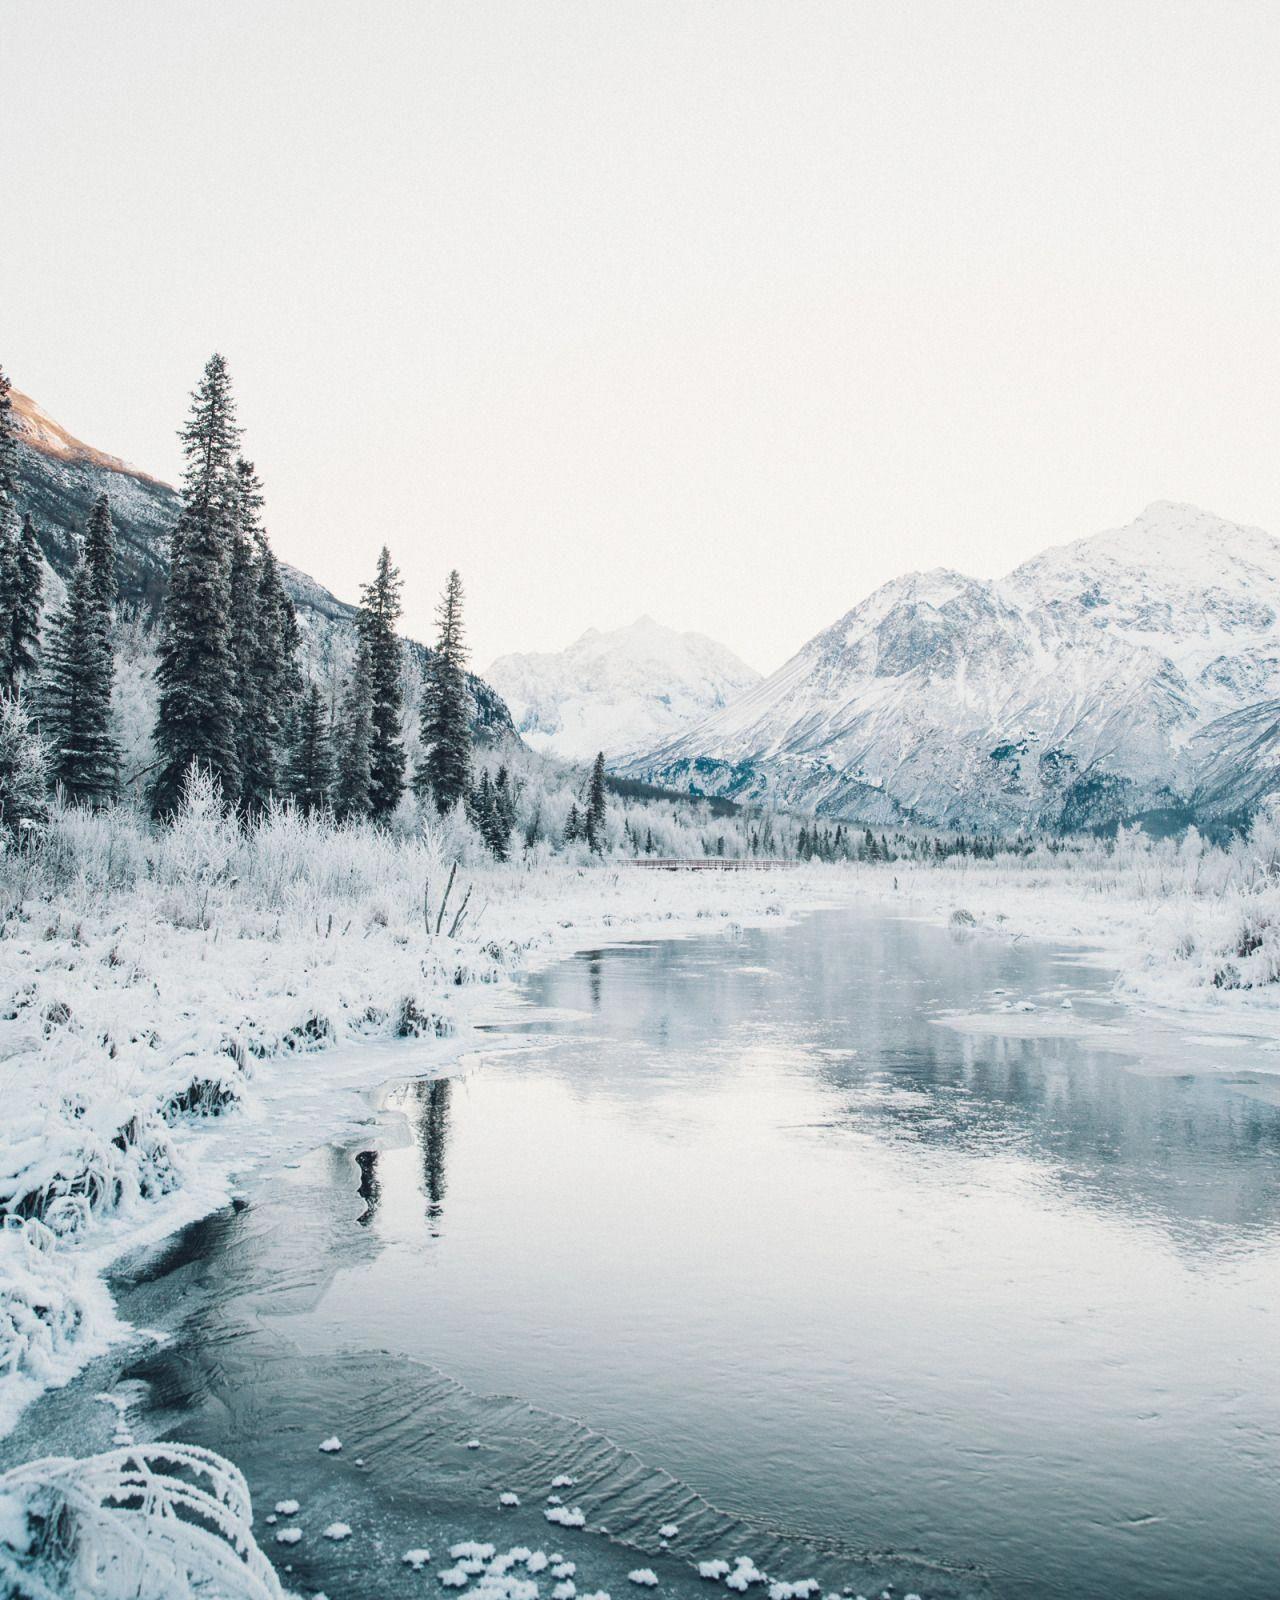 Зима, холод в картинках  8fda0967e78ce3d053e592232d836c58